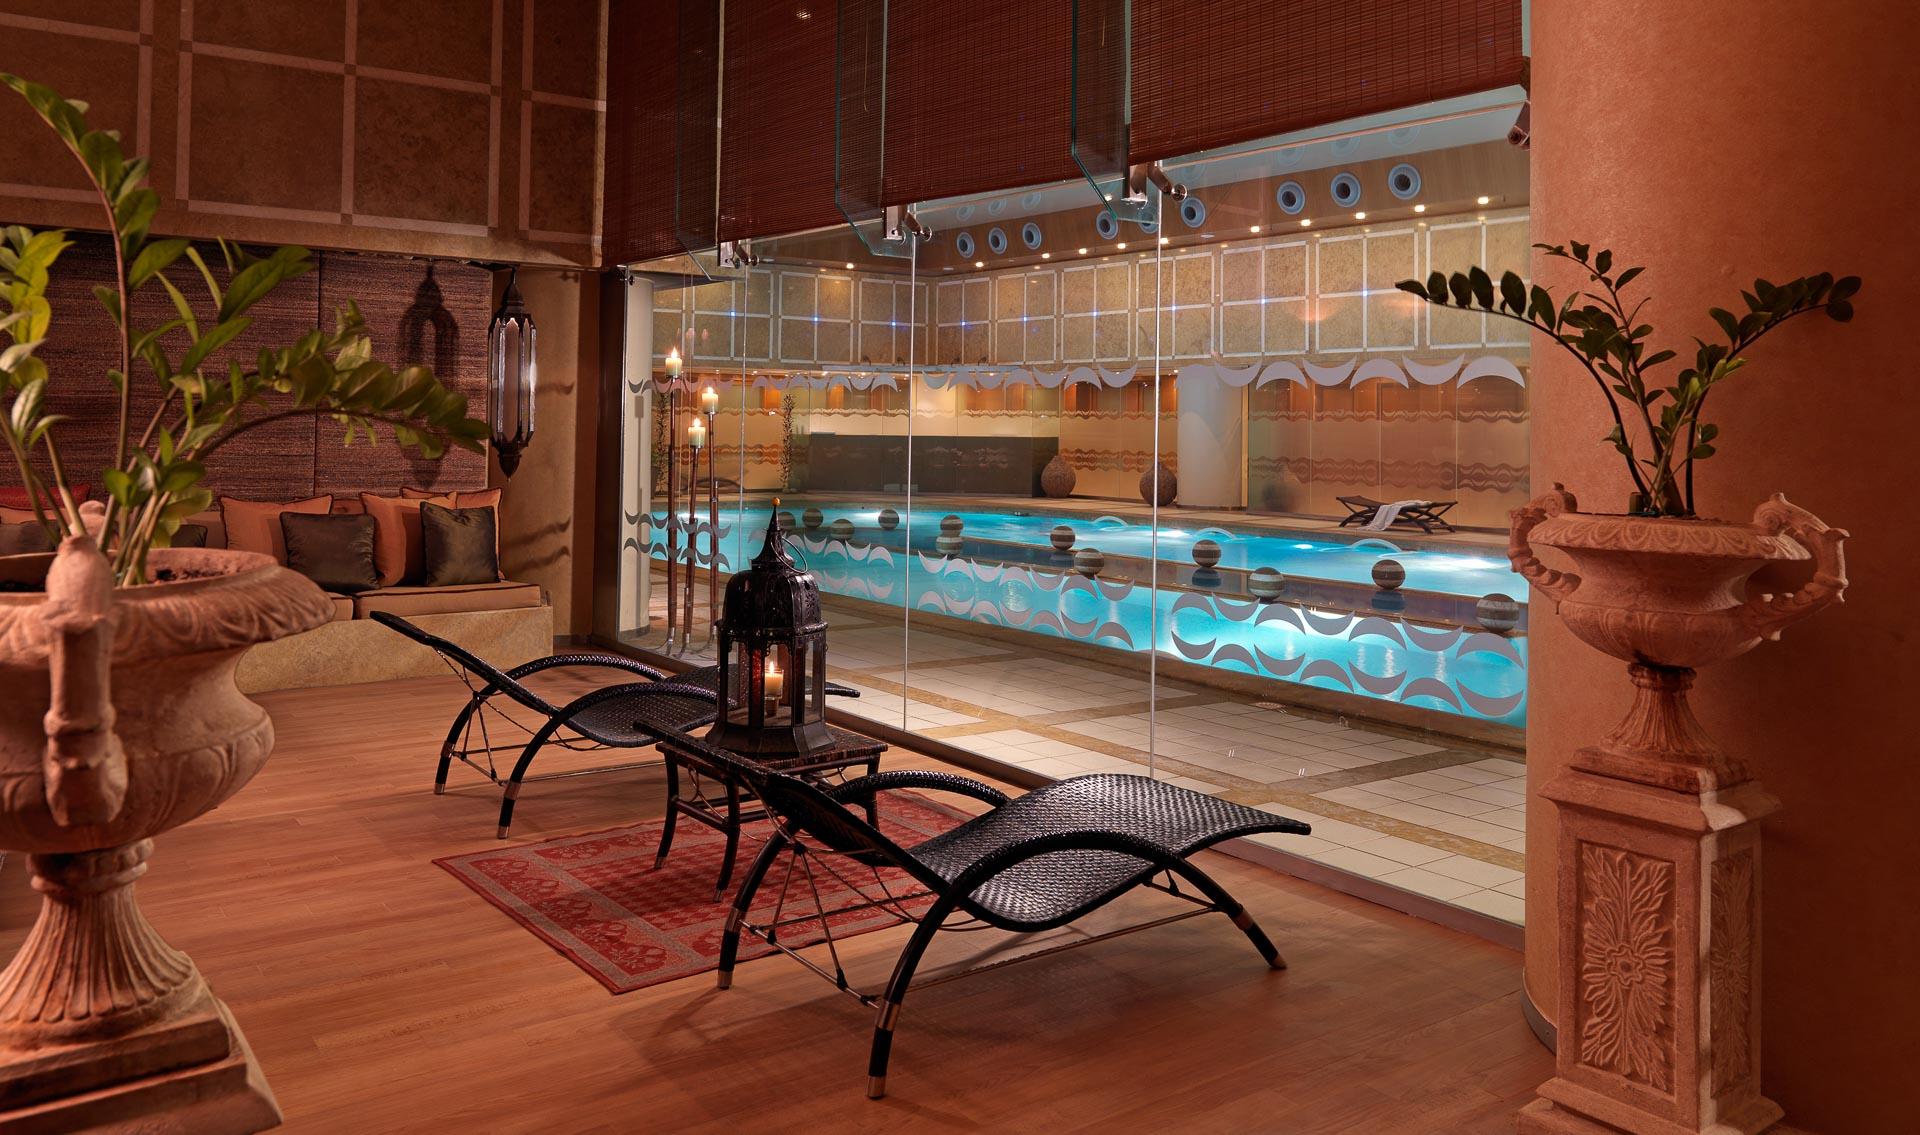 Divani Indoor Pool